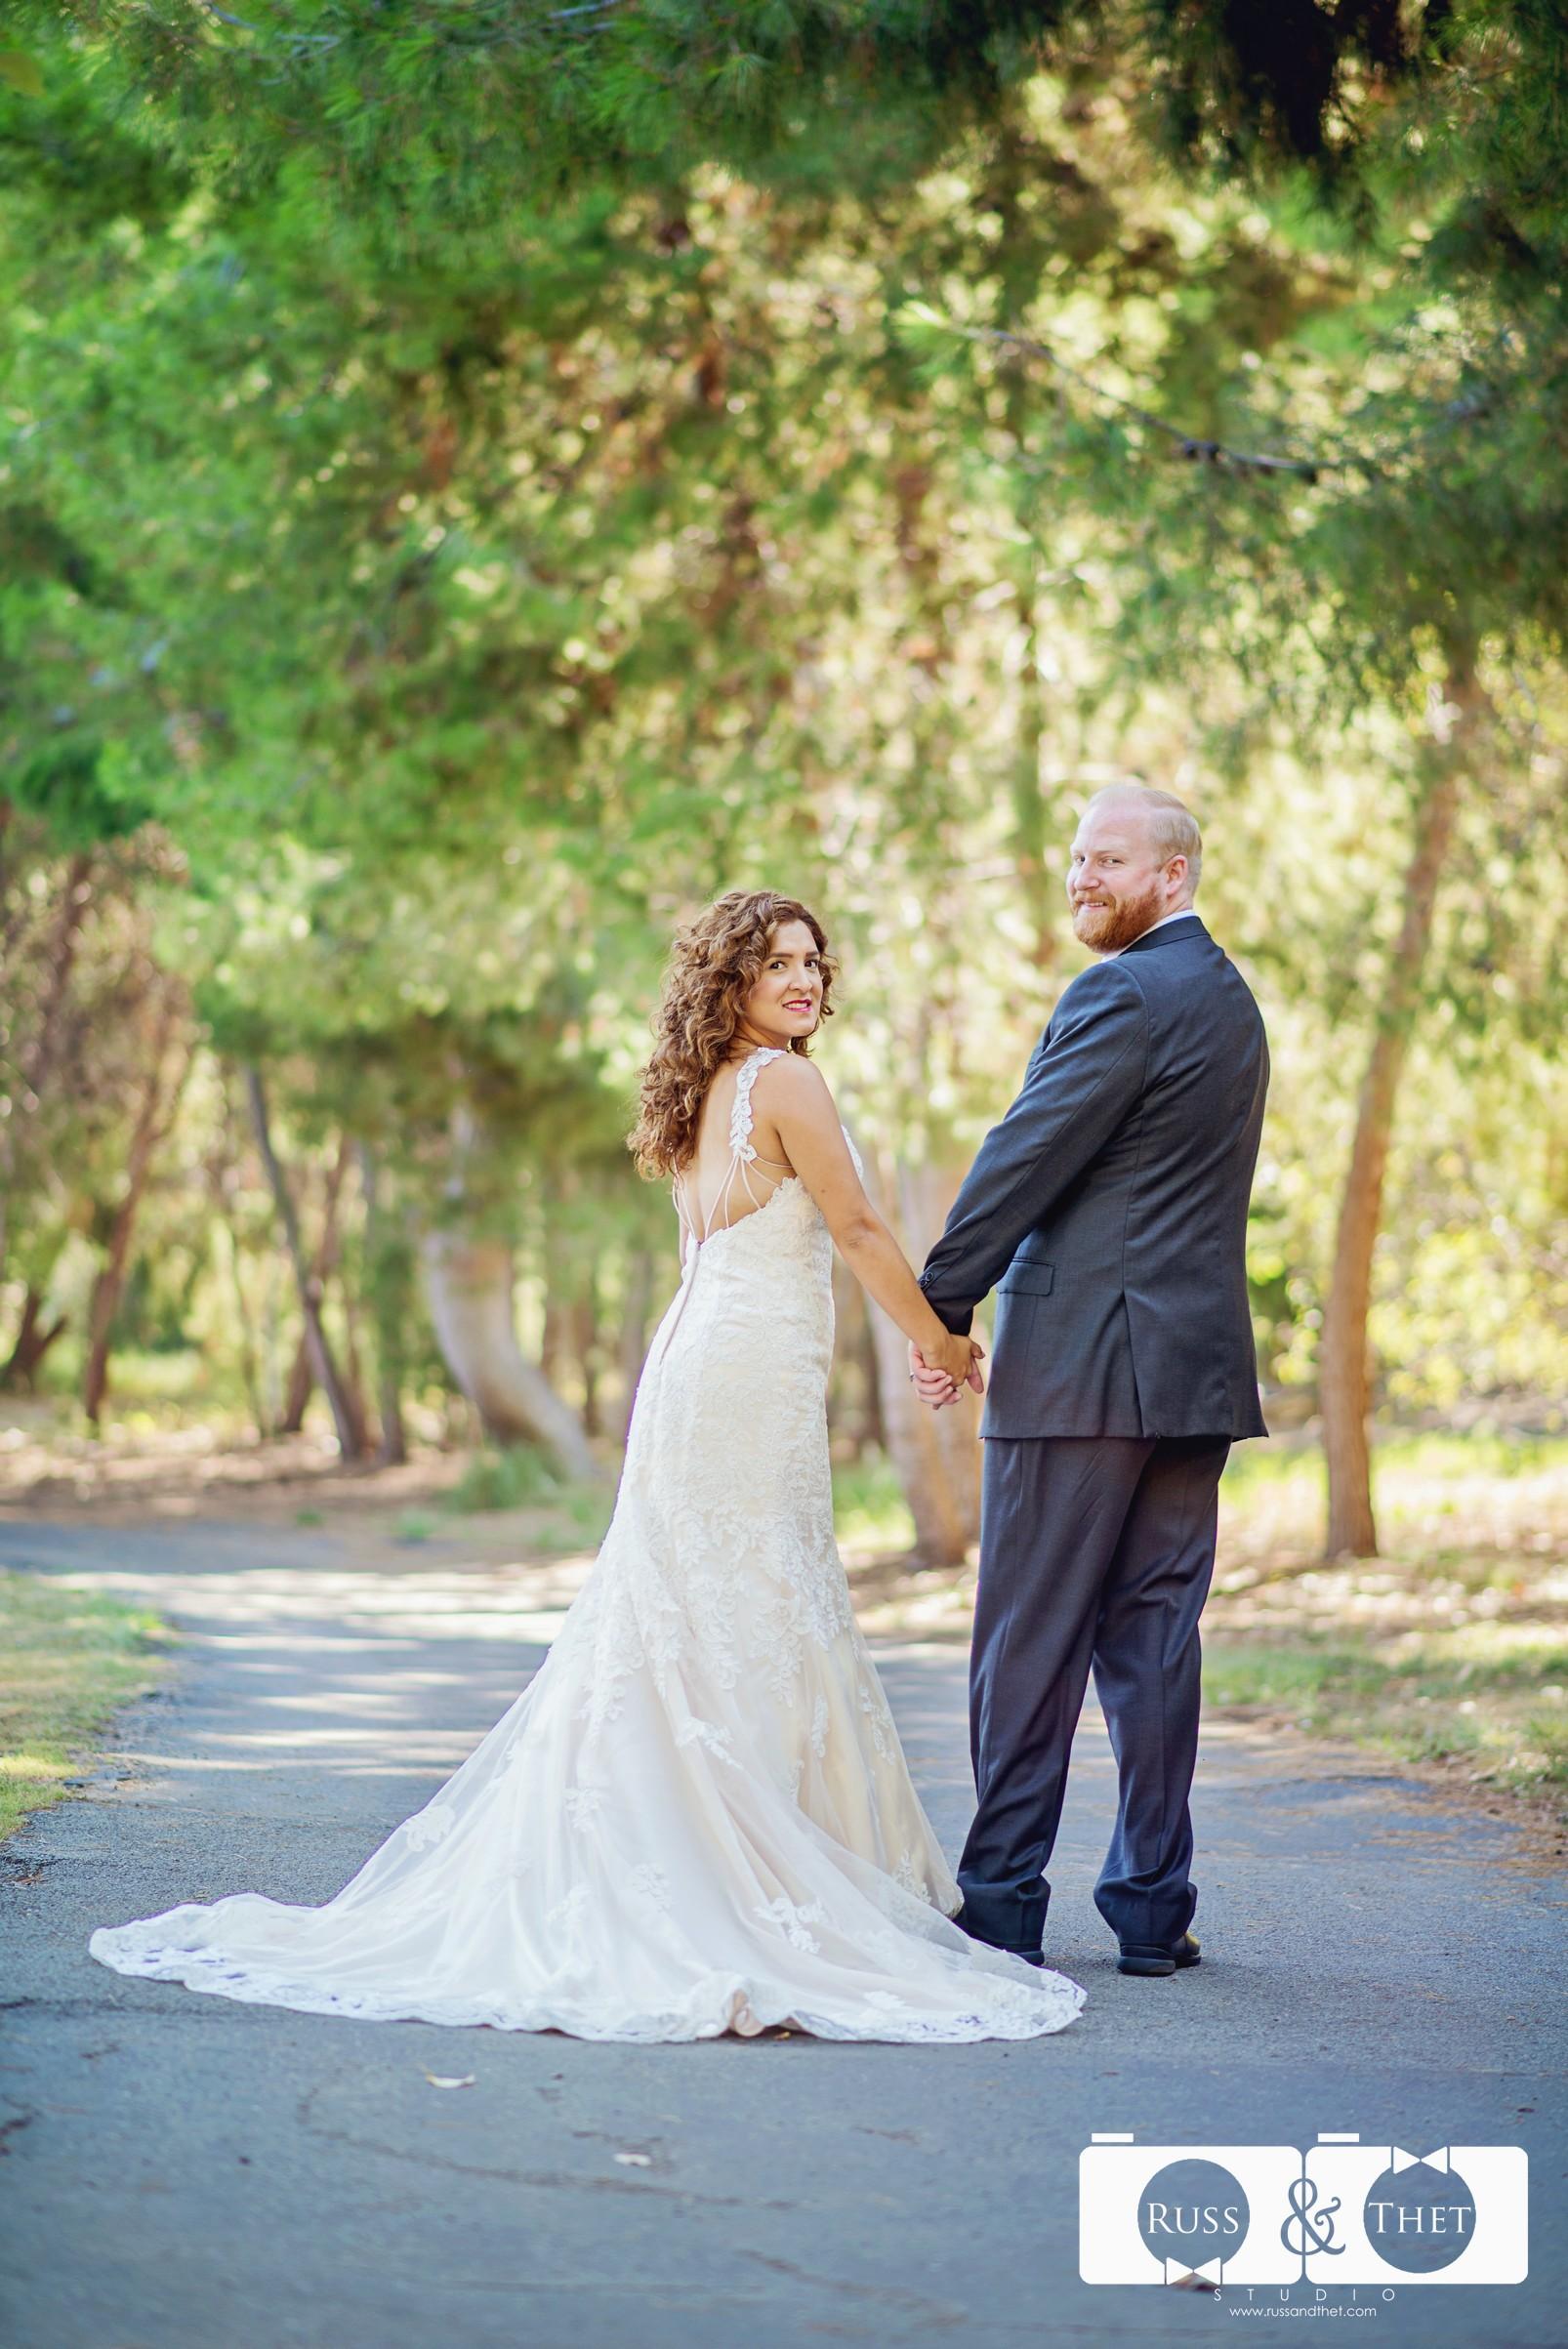 Andrew-and-Cristina-Yorba-Park-Wedding-Photographers (8).jpg